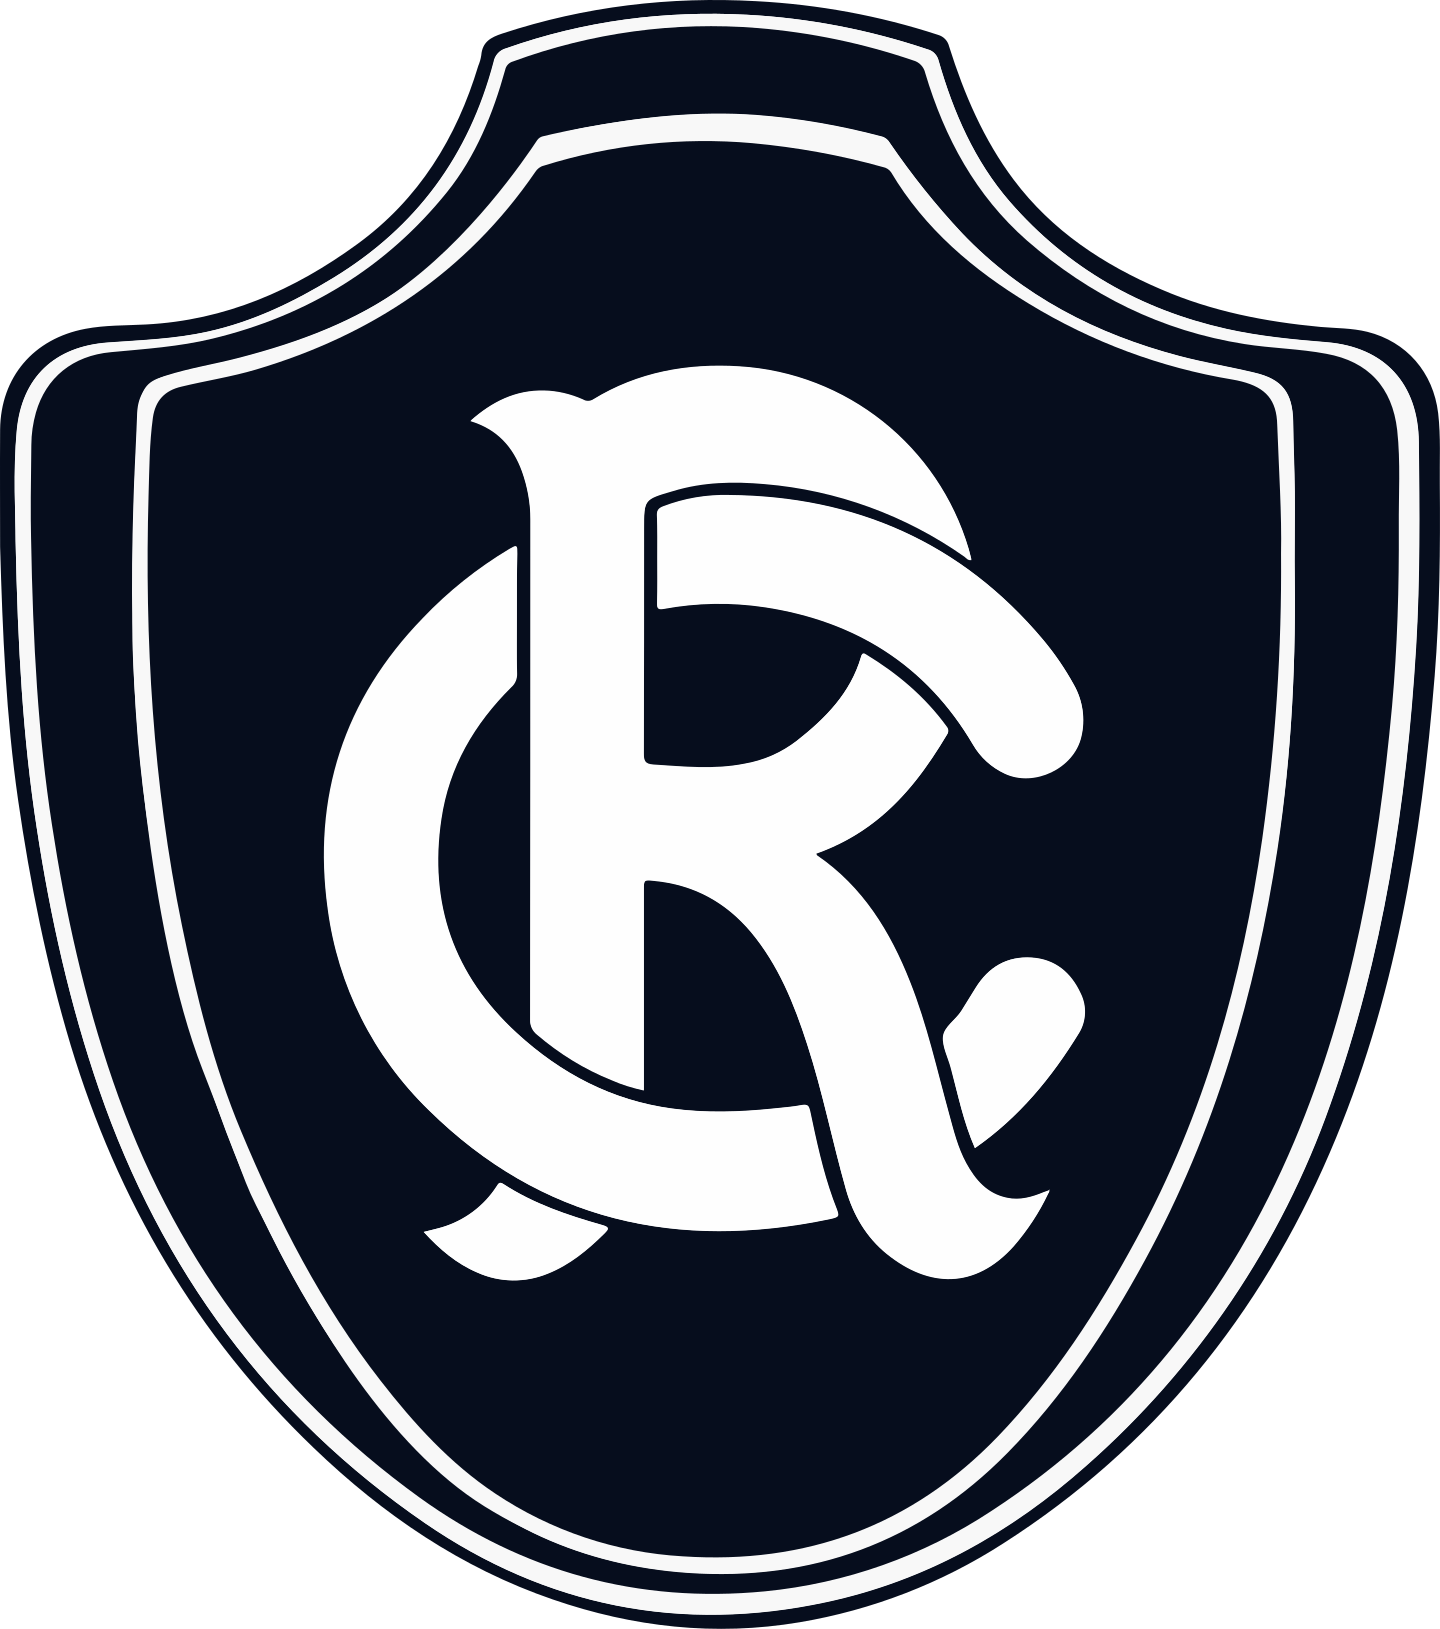 remo logo 2 1 - Remo Logo